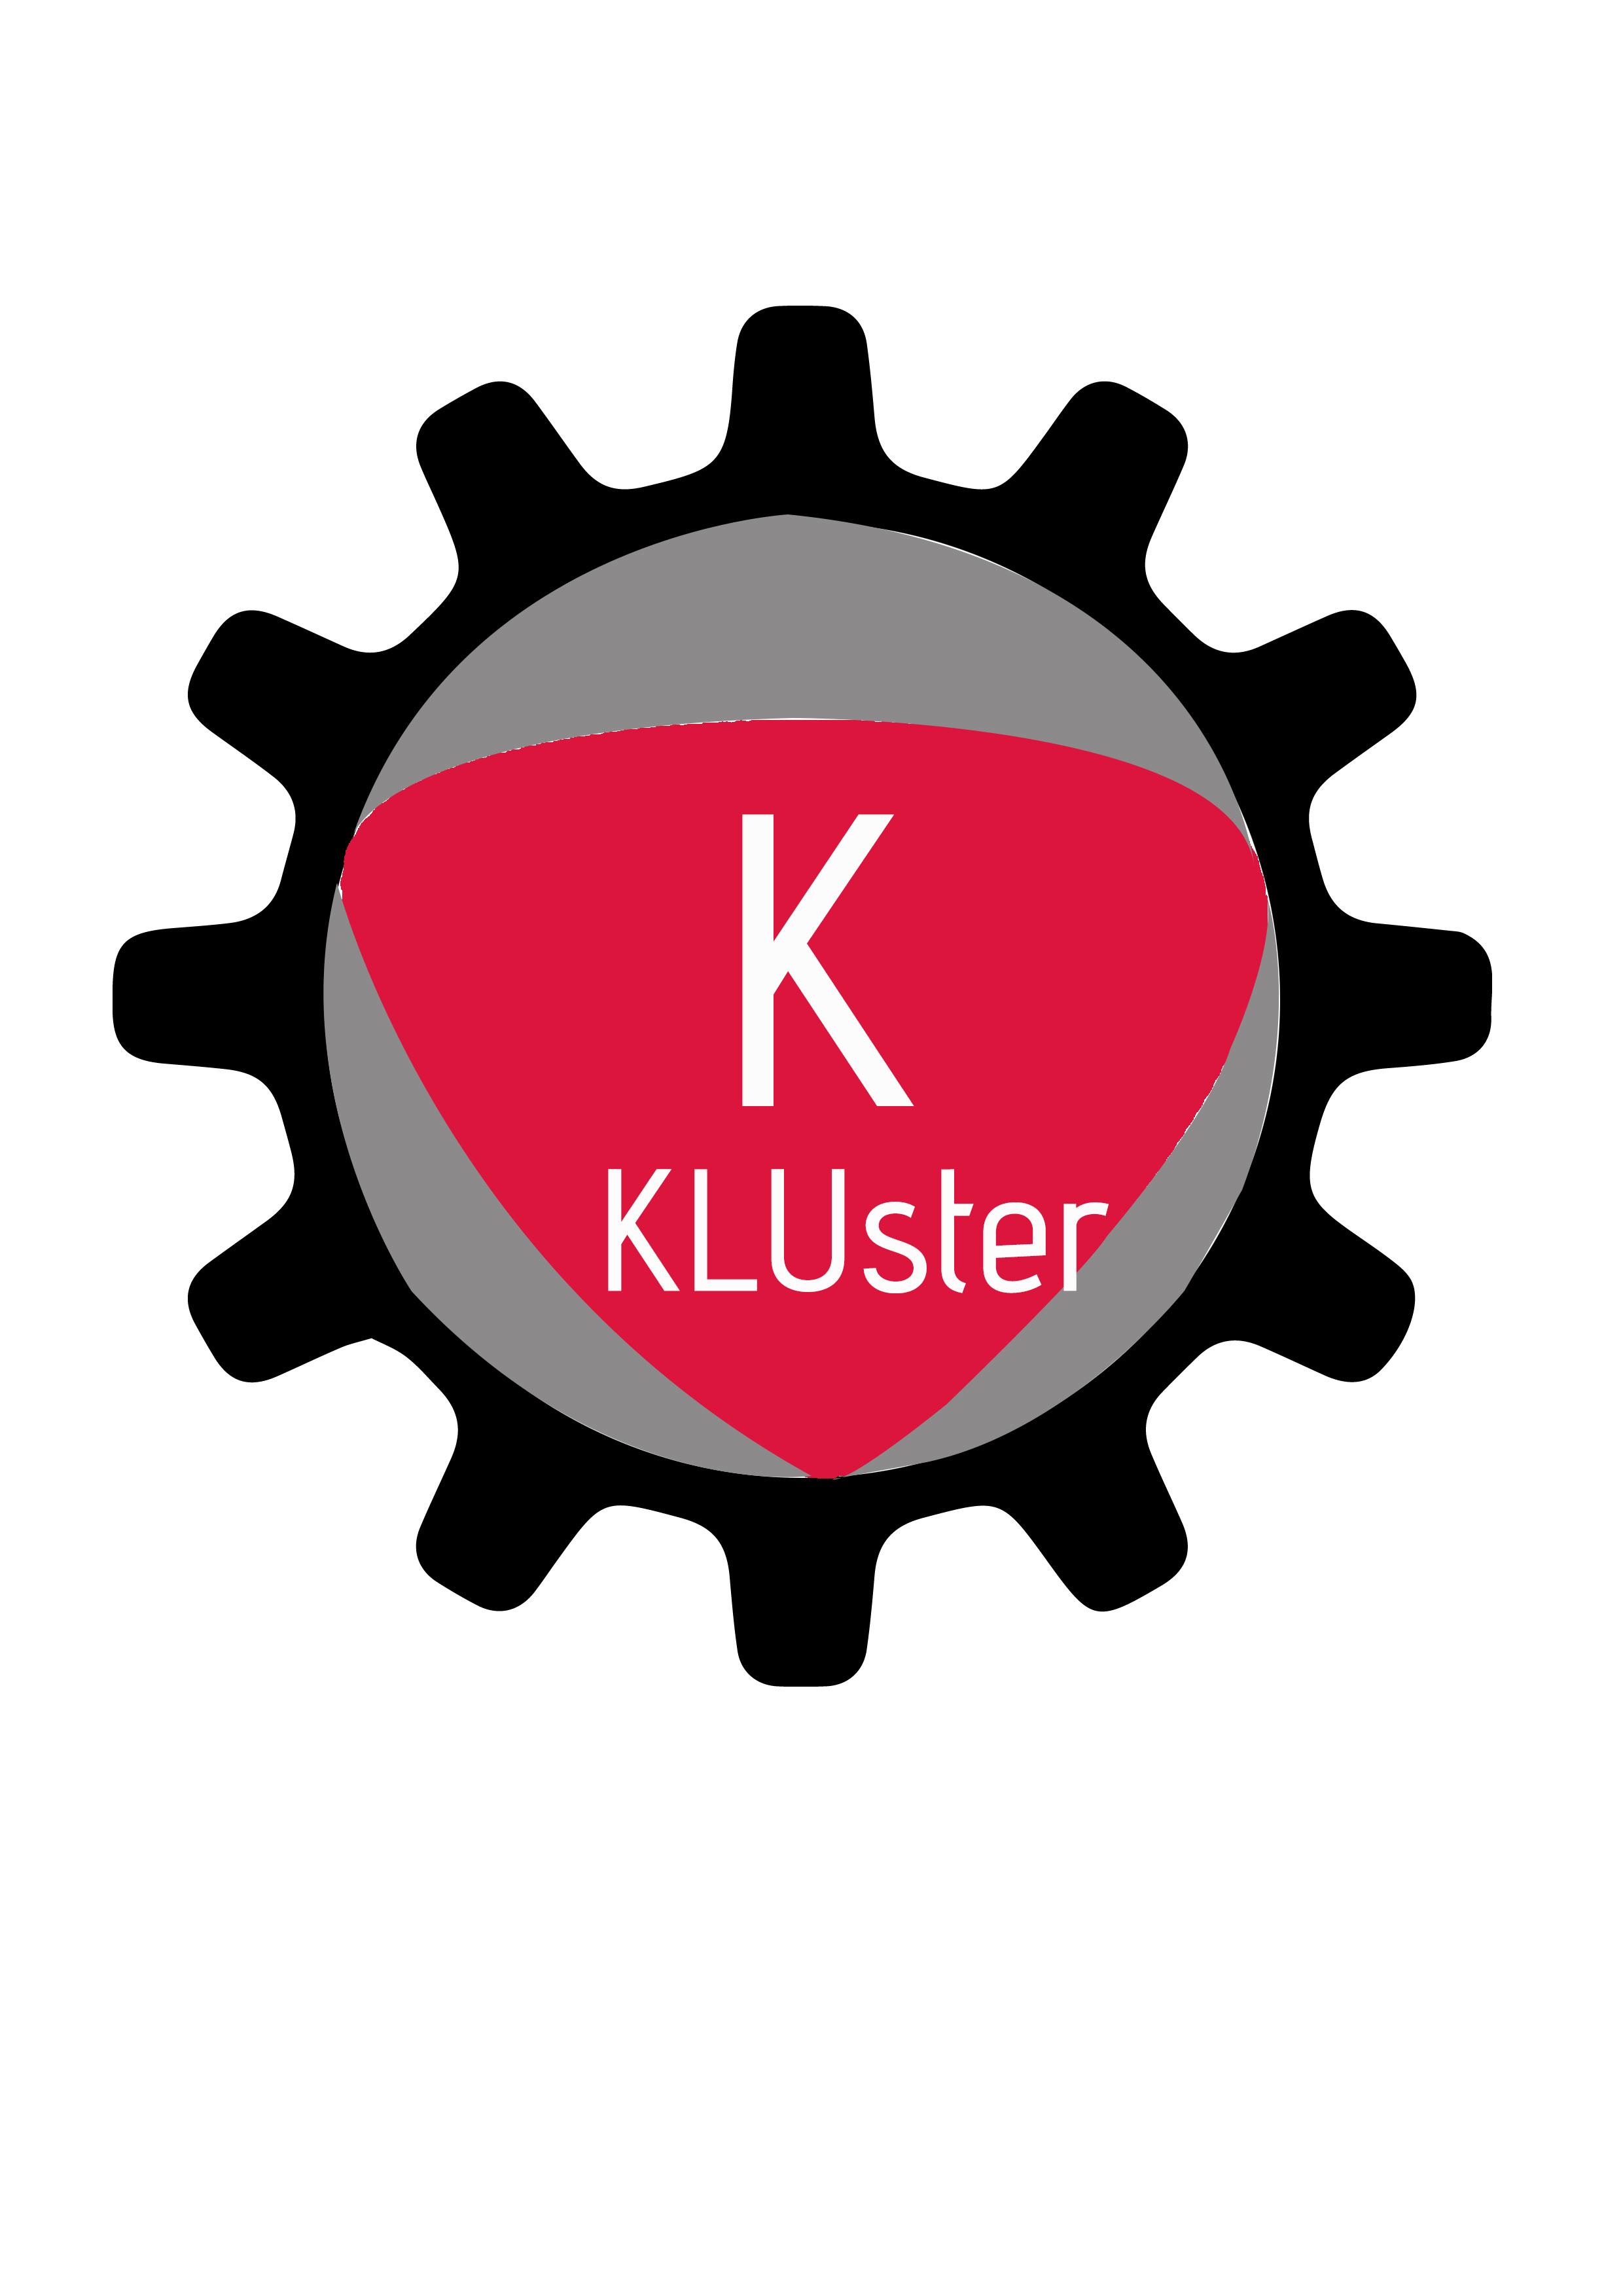 kluster wallpapers/logo.png